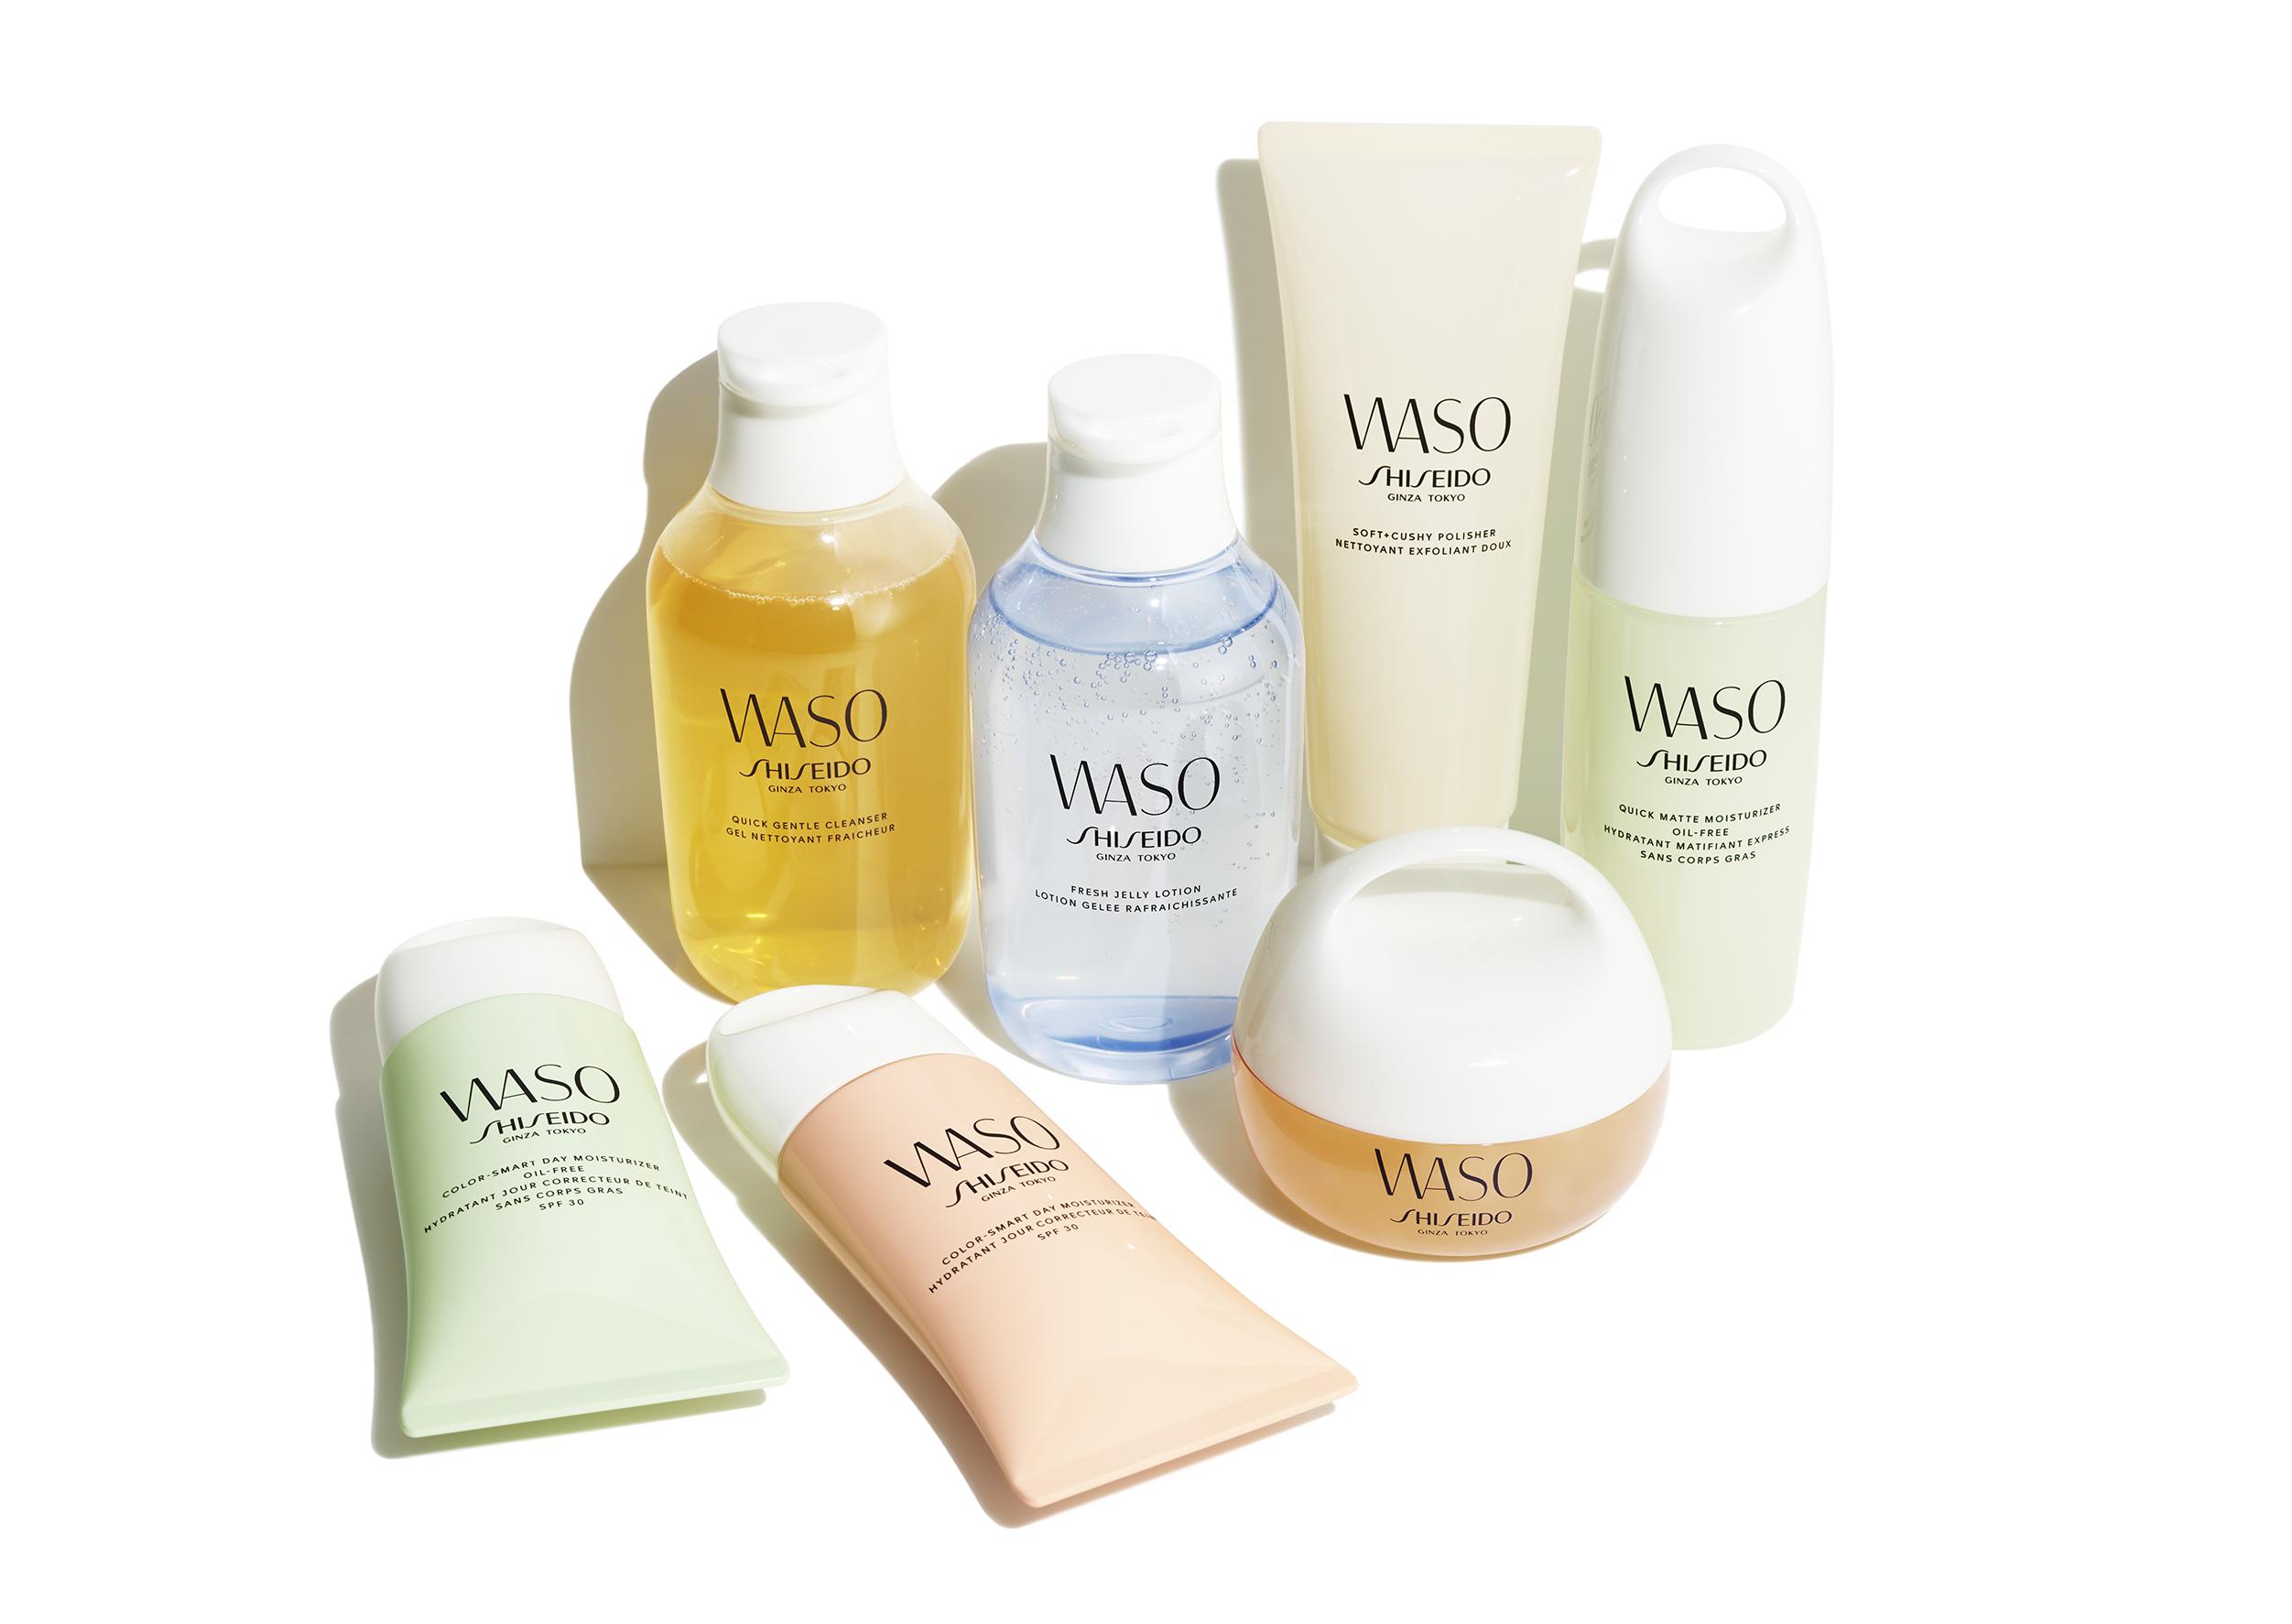 WASO GroupShot